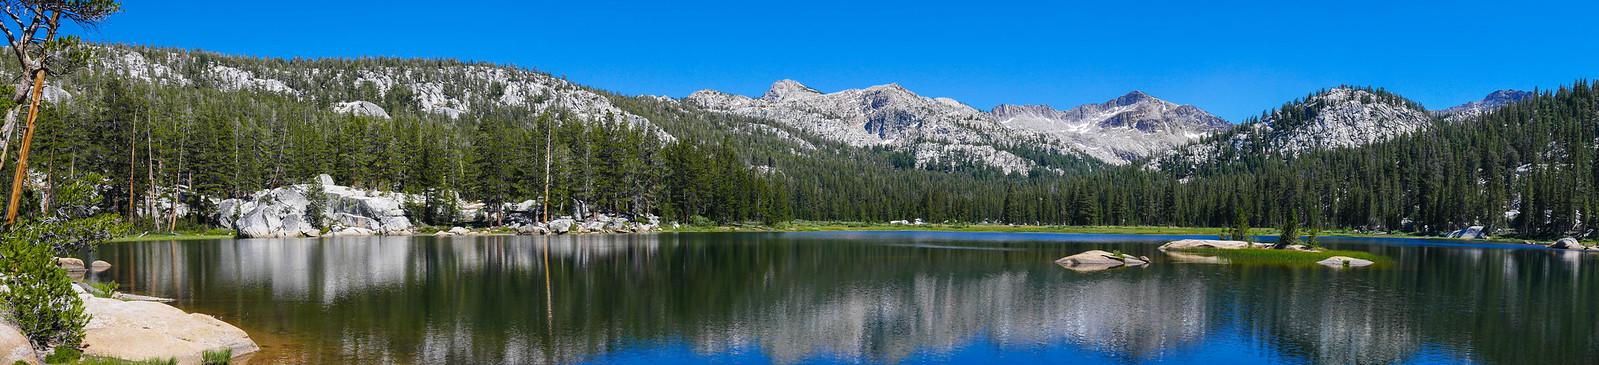 Grassy Lake